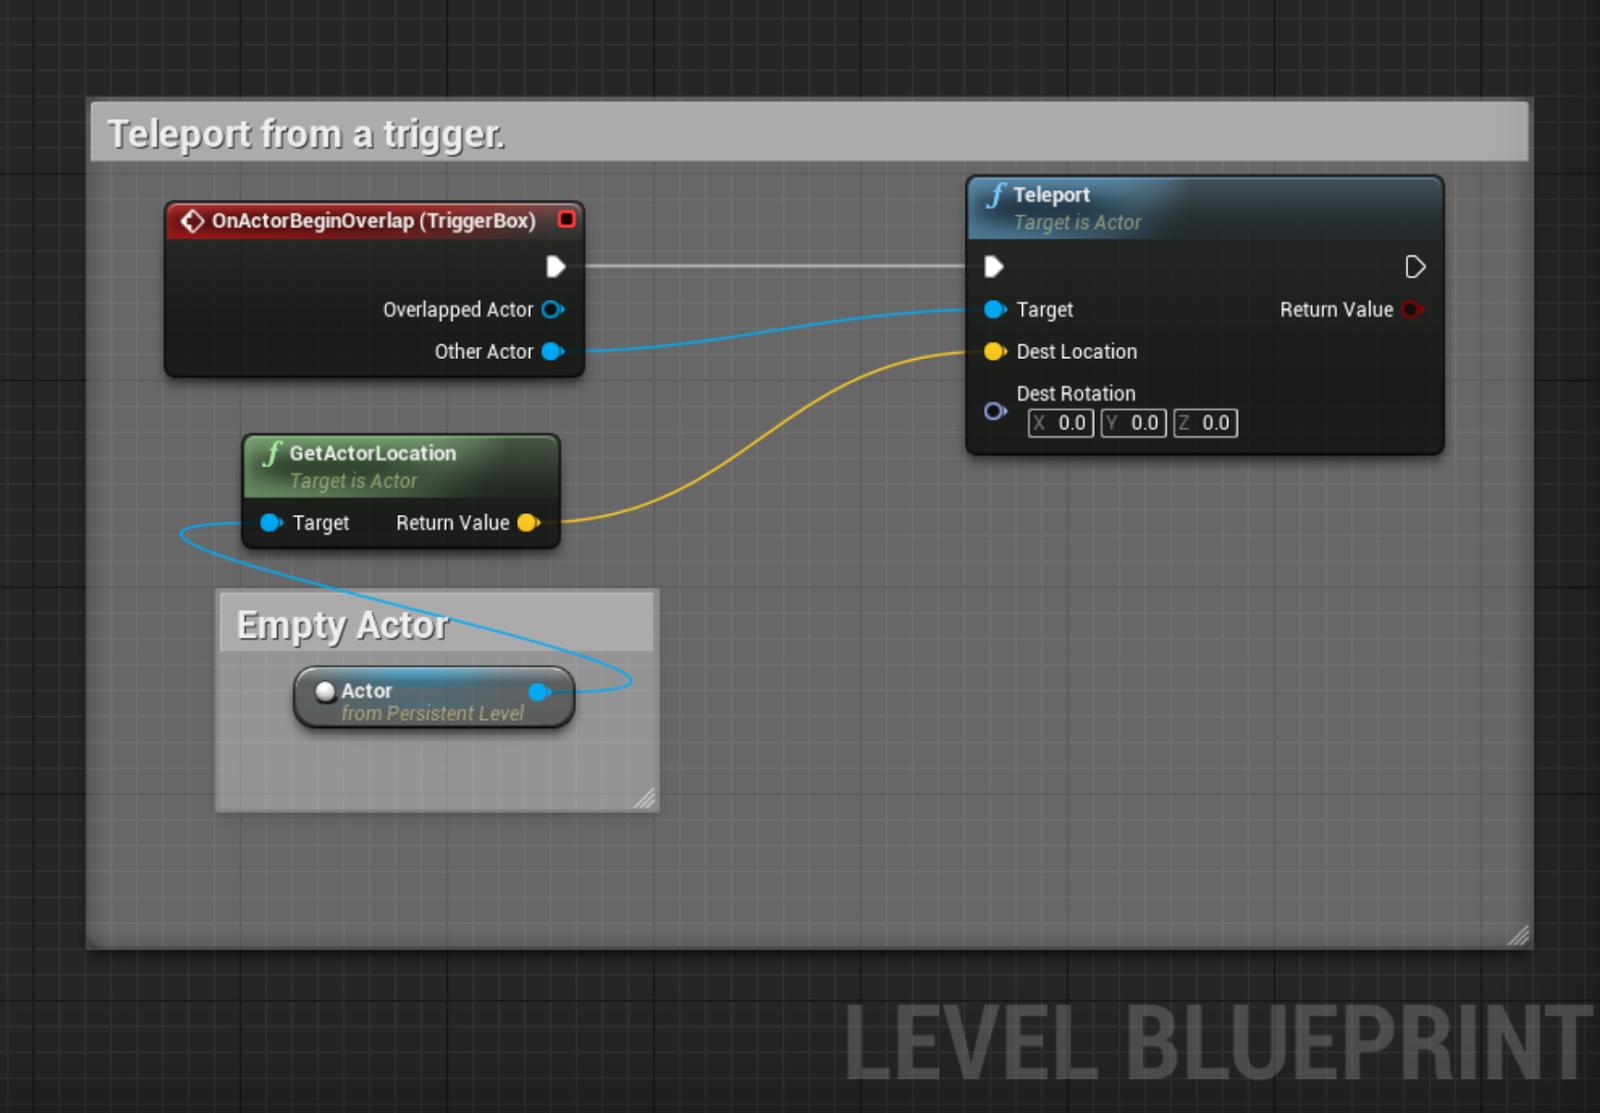 Ue4 simple blueprint teleport malvernweather Choice Image